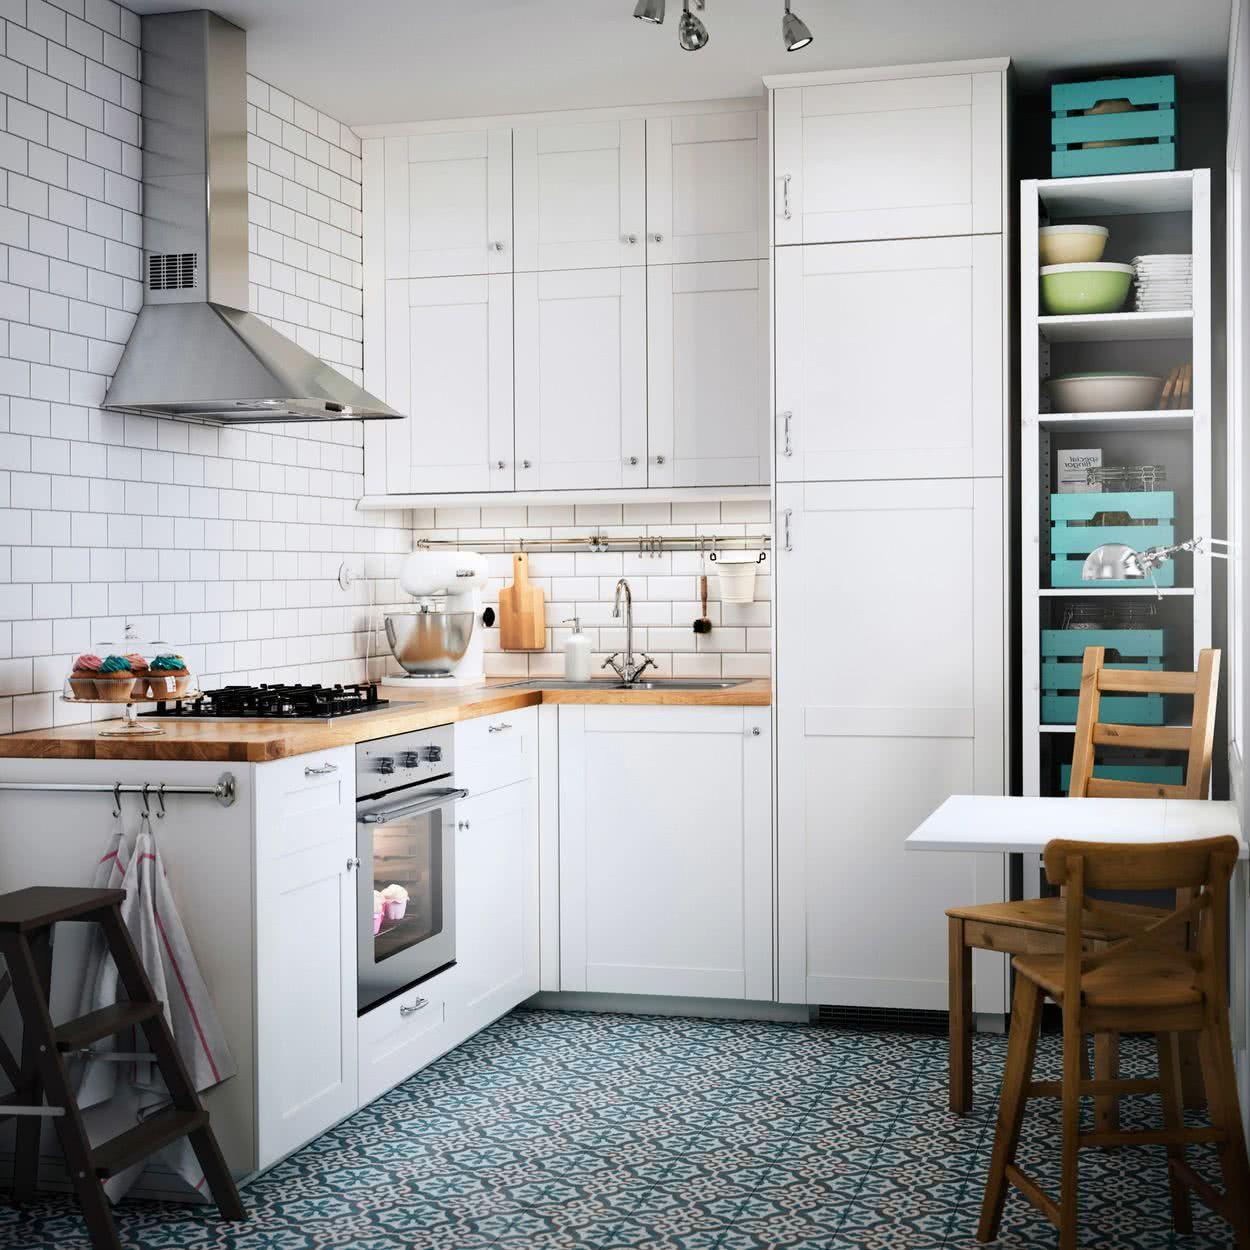 Styles in Latest Kitchen Design Trends 2021 8